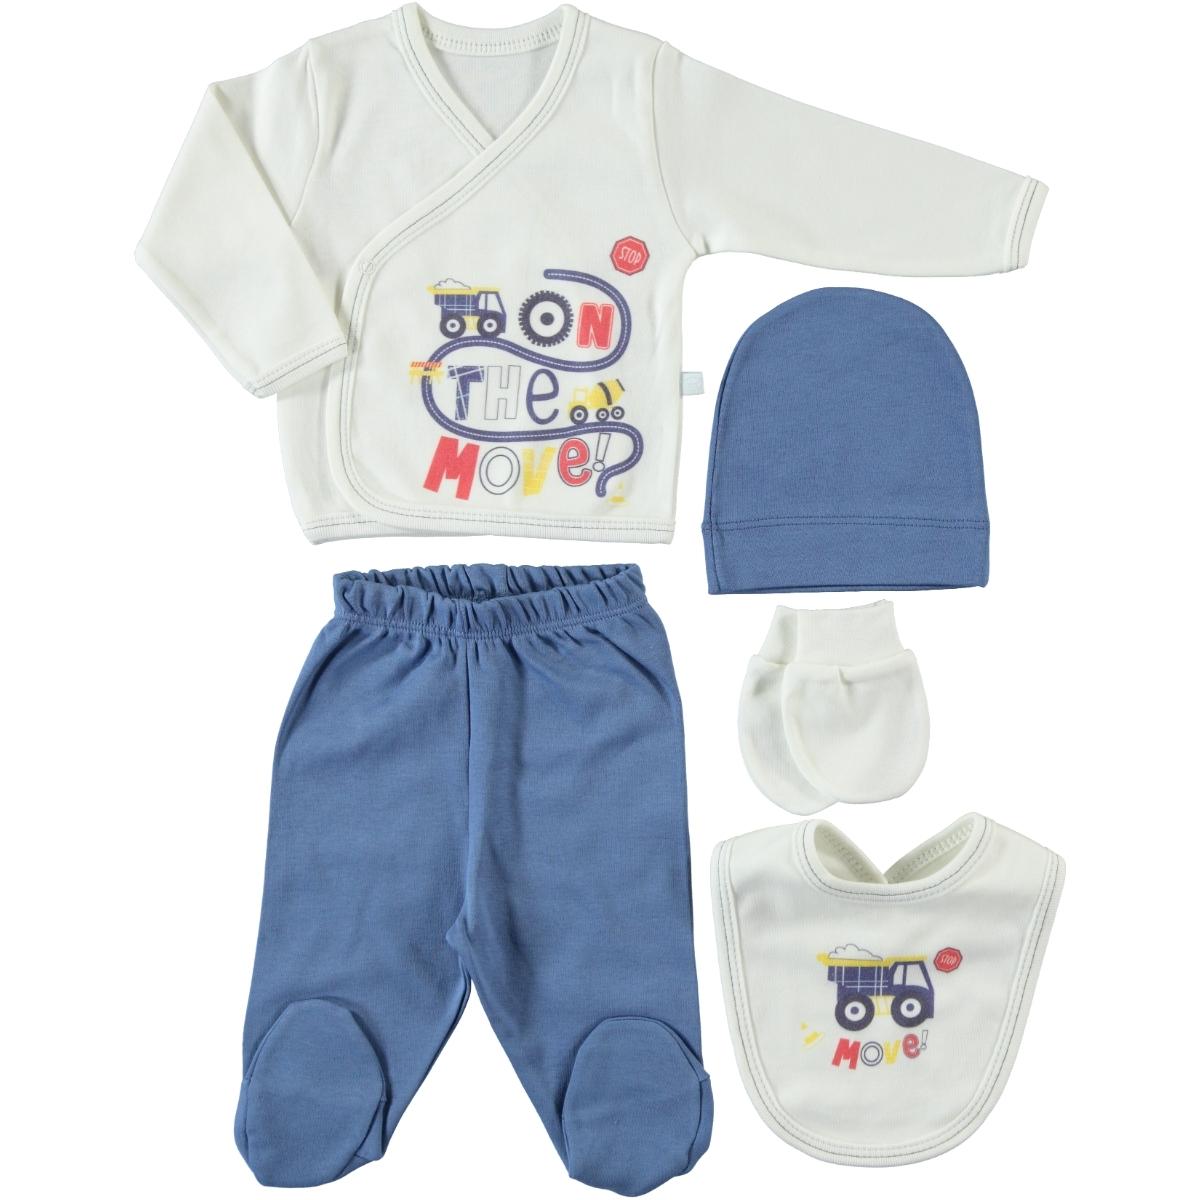 Civil Baby Baby boy Newborn 5 Zibin Indigo Kit